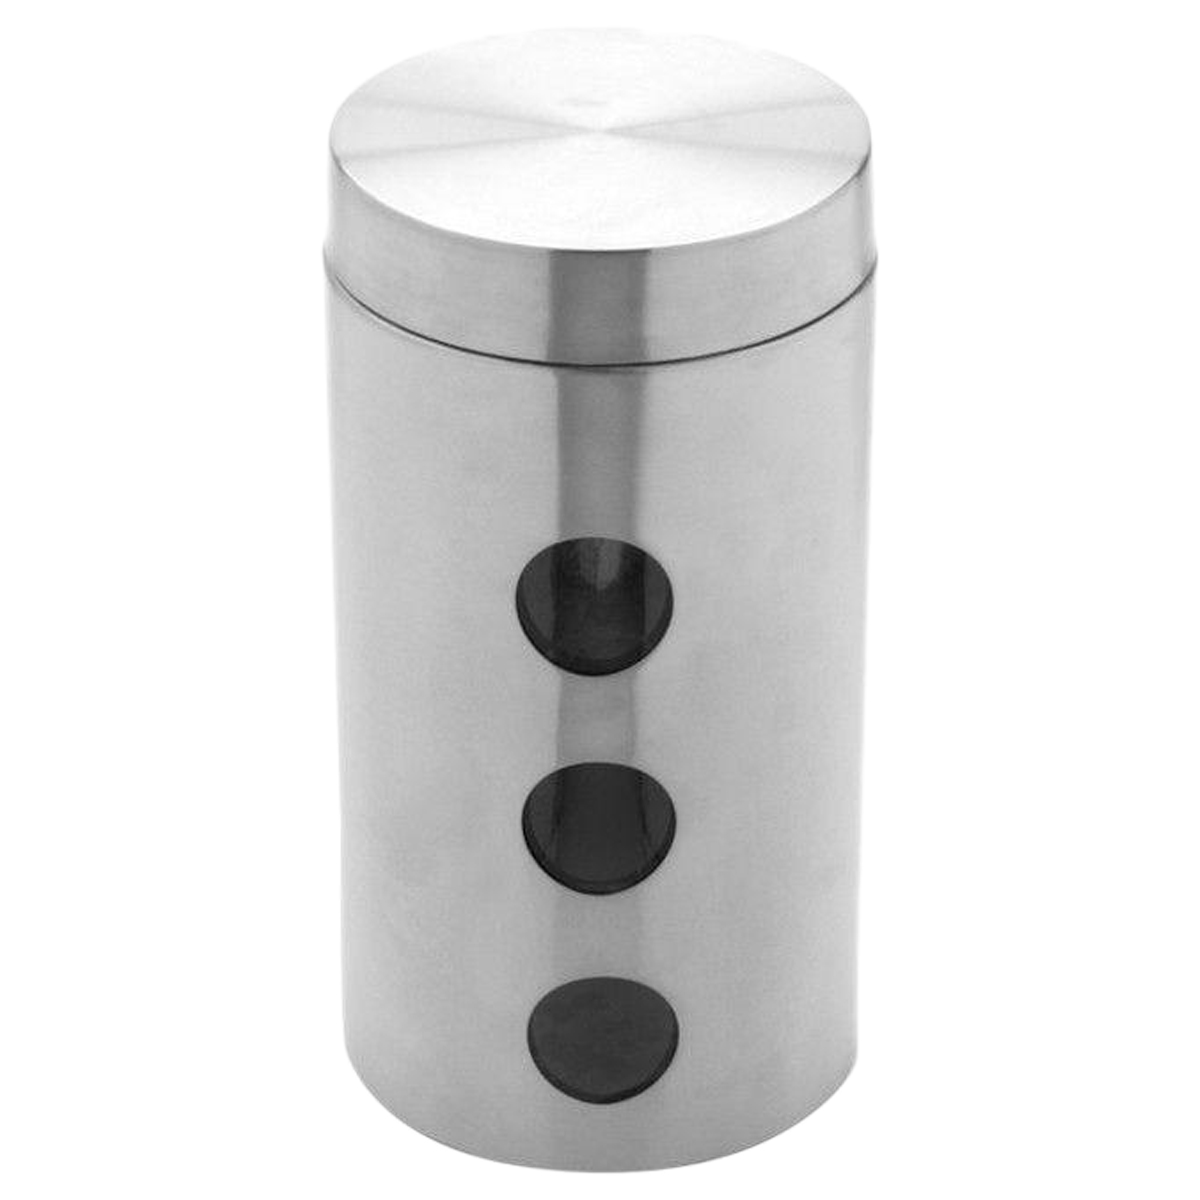 Jogo 3 Porta Mantimentos Aço Inox 1,6/1,2/0,7 L Bon Gourmet